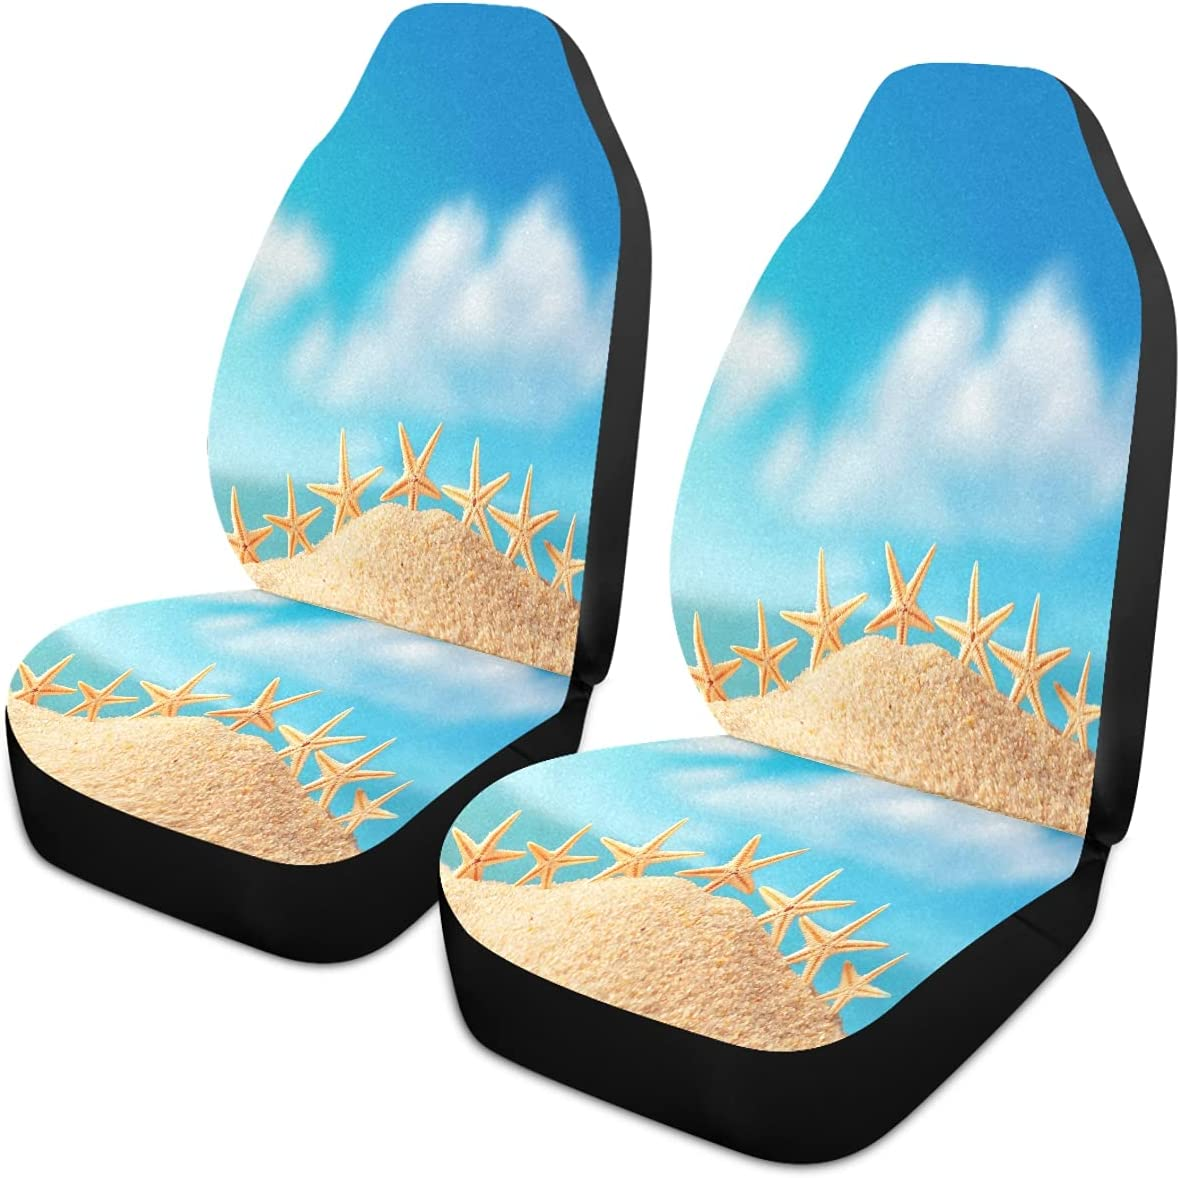 Oarencol Starfish Beach Sandy Sacramento Mall Blue Elegant Universal Car Sky Covers Seat